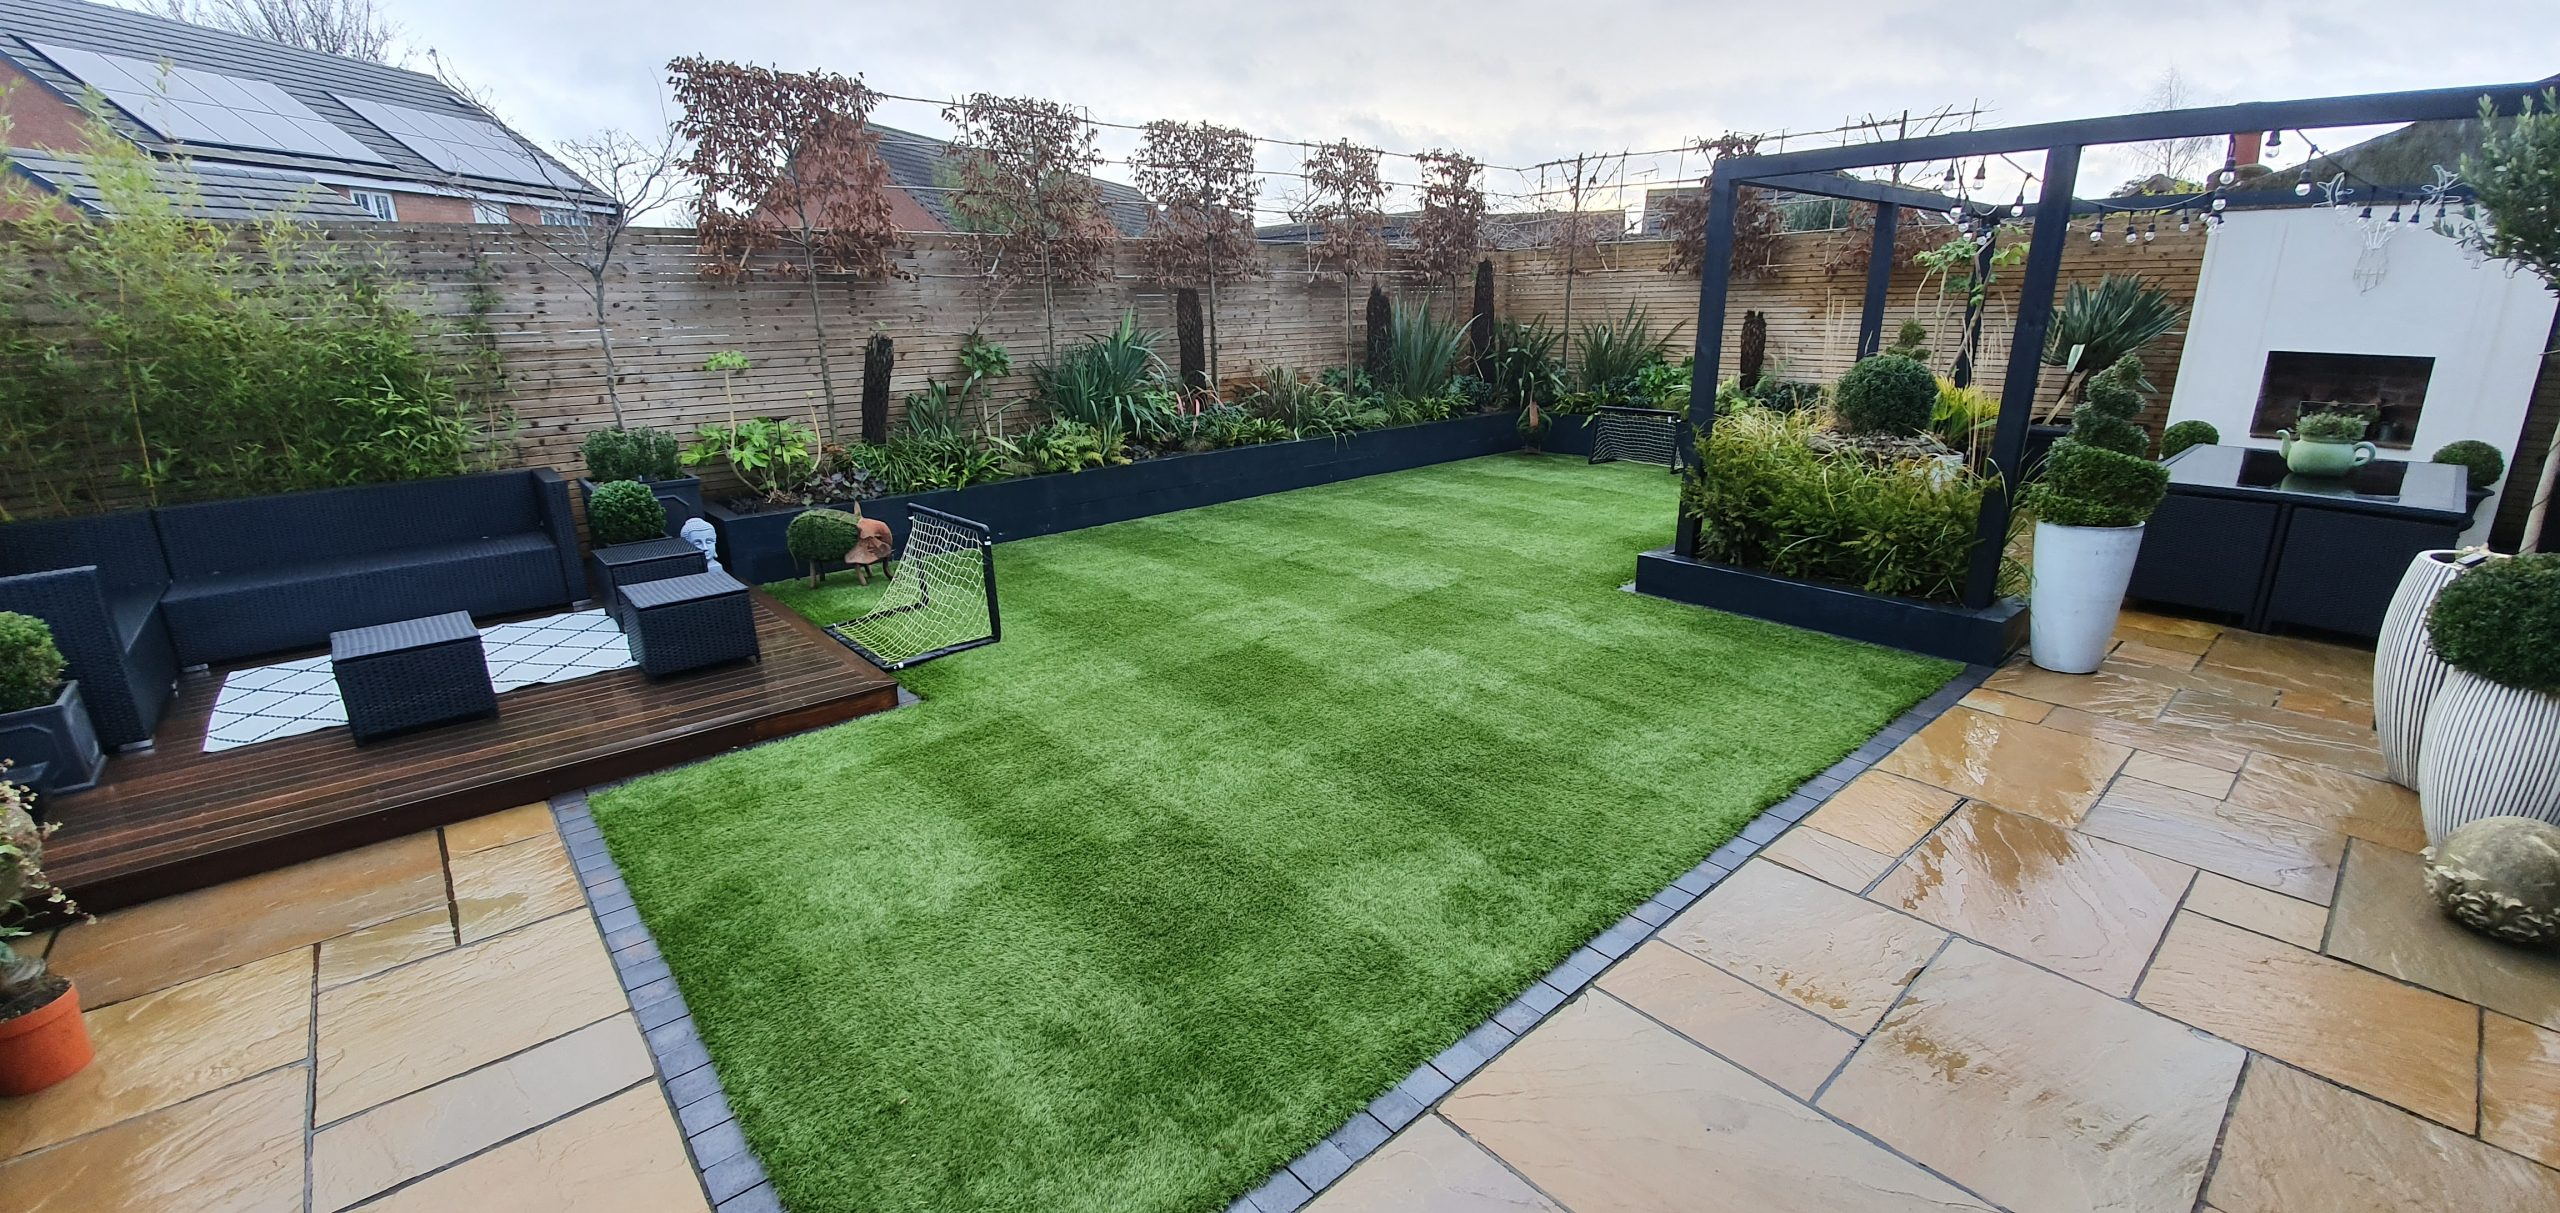 Regular Home gardening services by Back Gardens Ltd